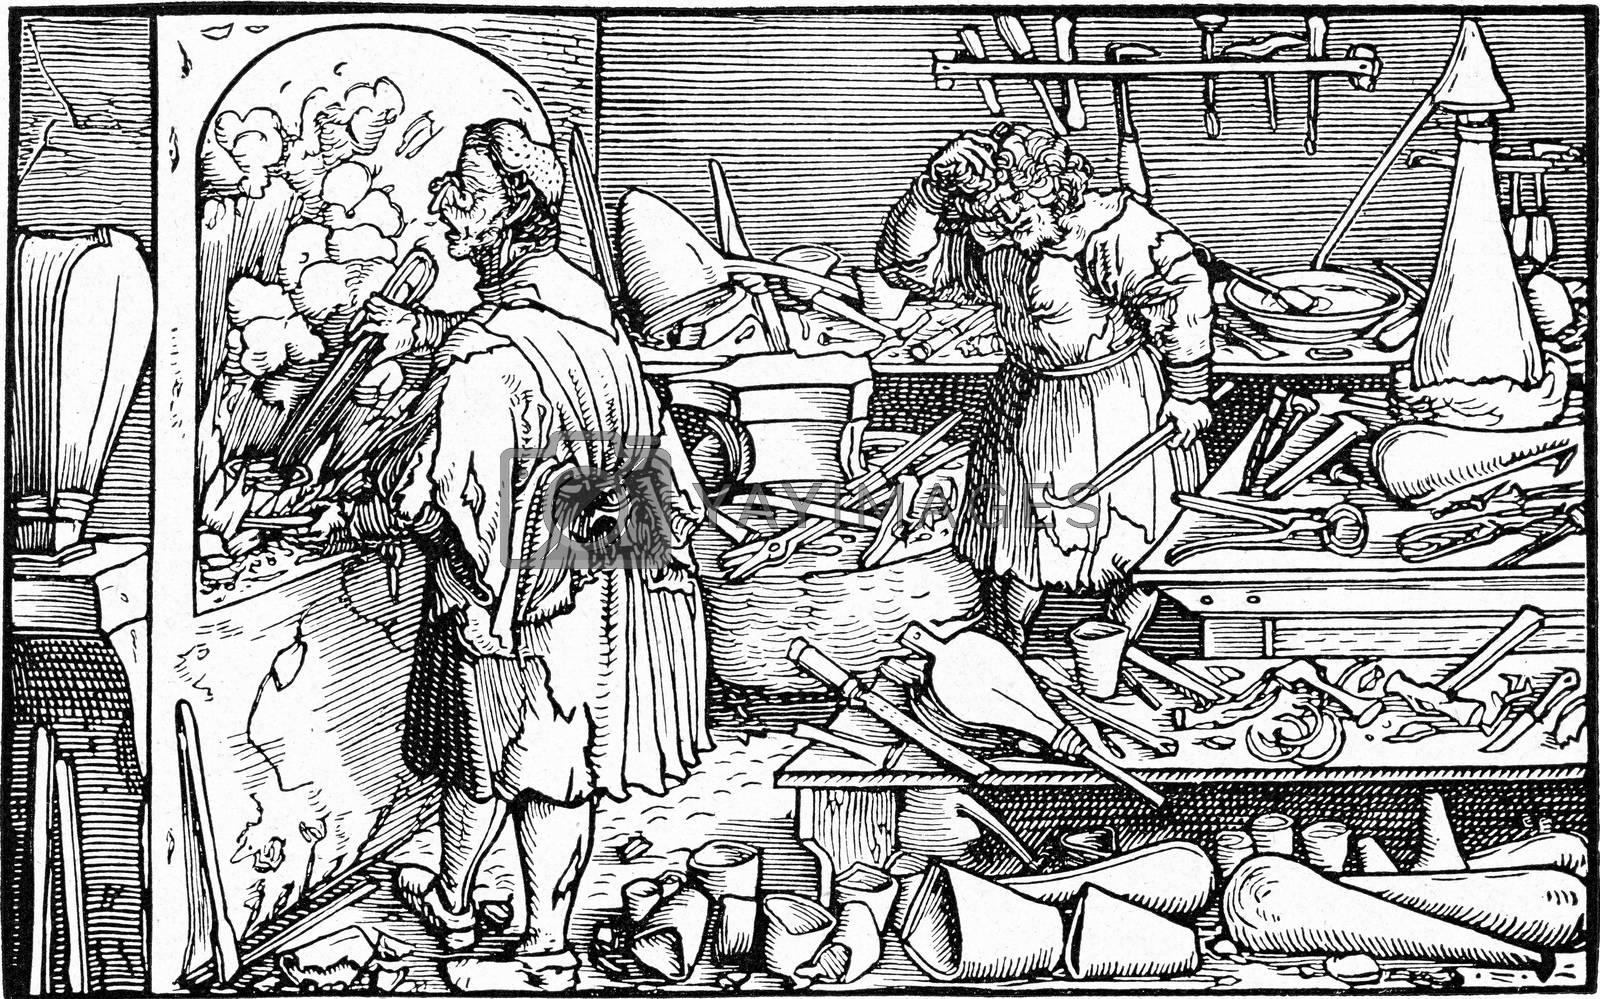 Alchemist laboratory, vintage engraving. by Morphart